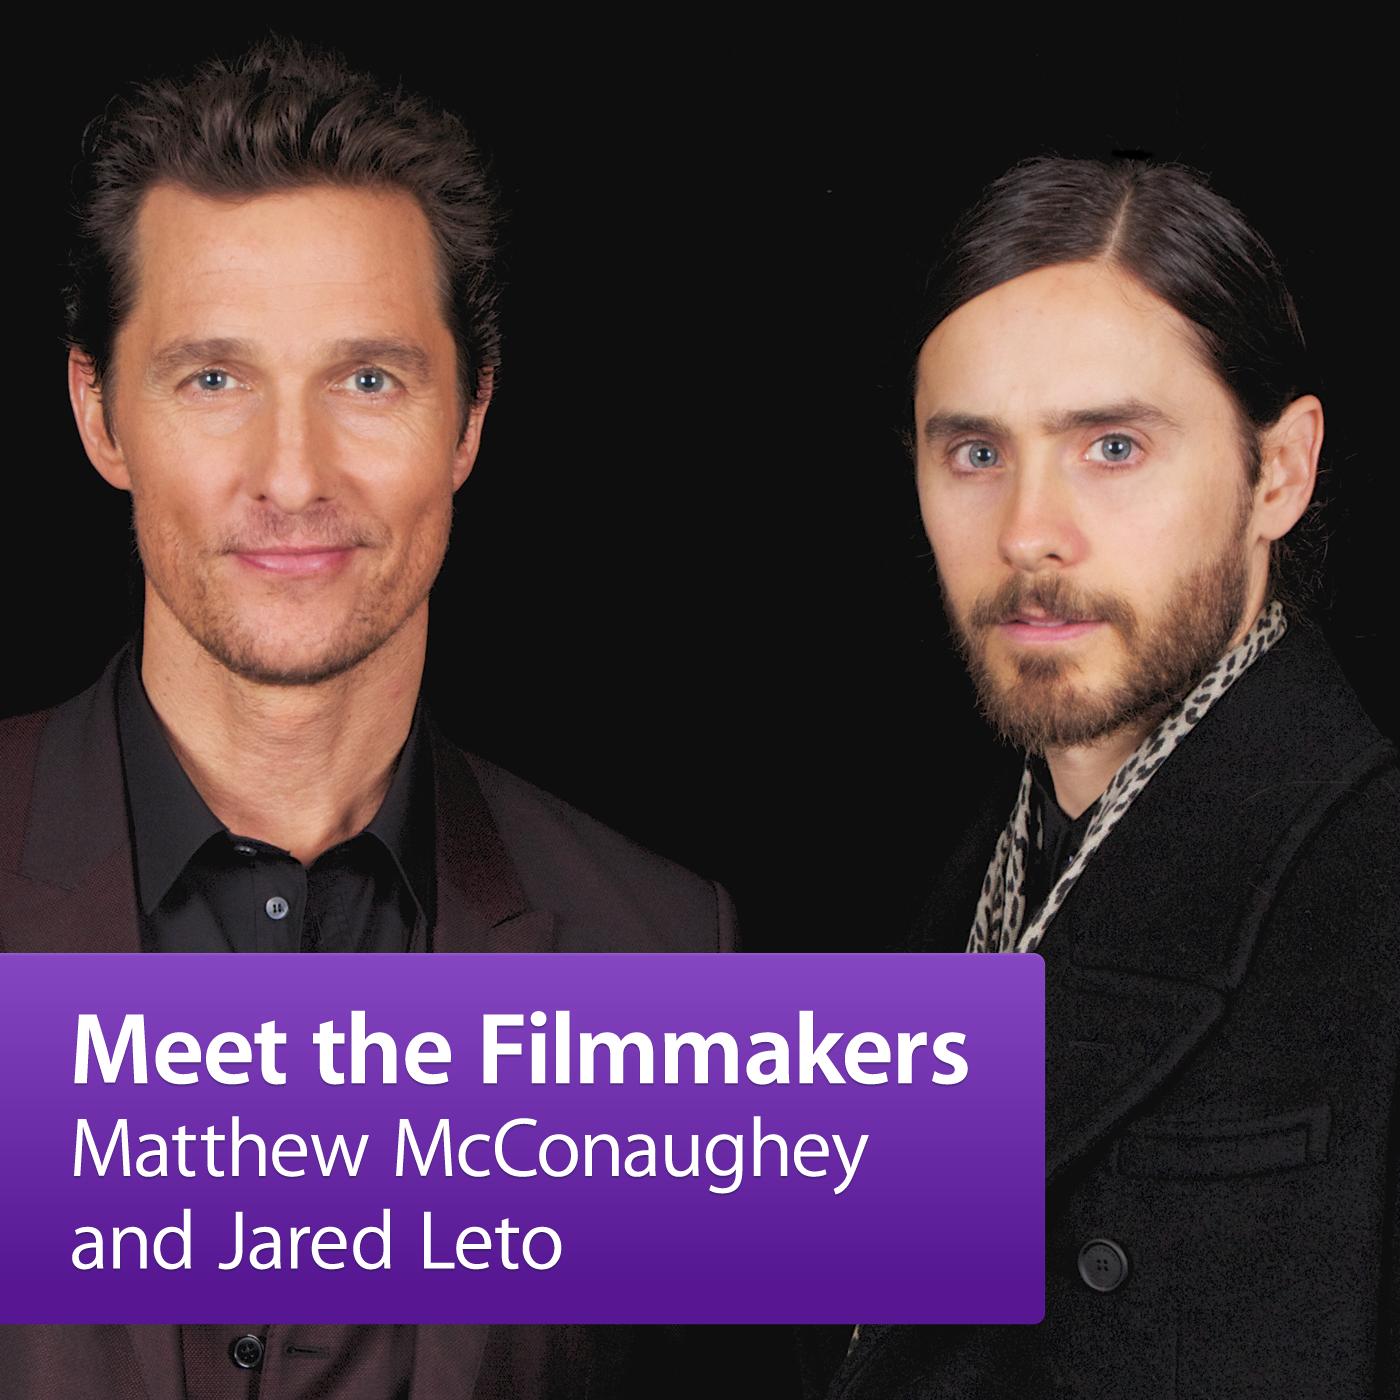 Matthew McConaughey and Jared Leto: Meet the Filmmaker